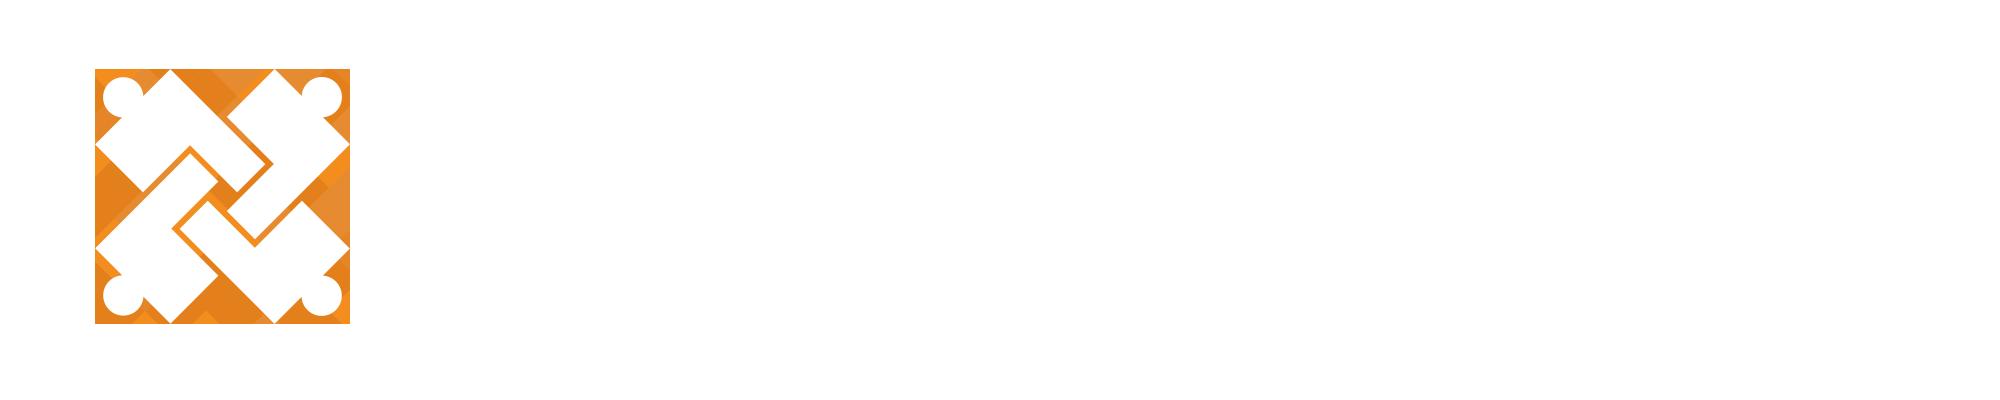 GlobalGiving_Logo.png